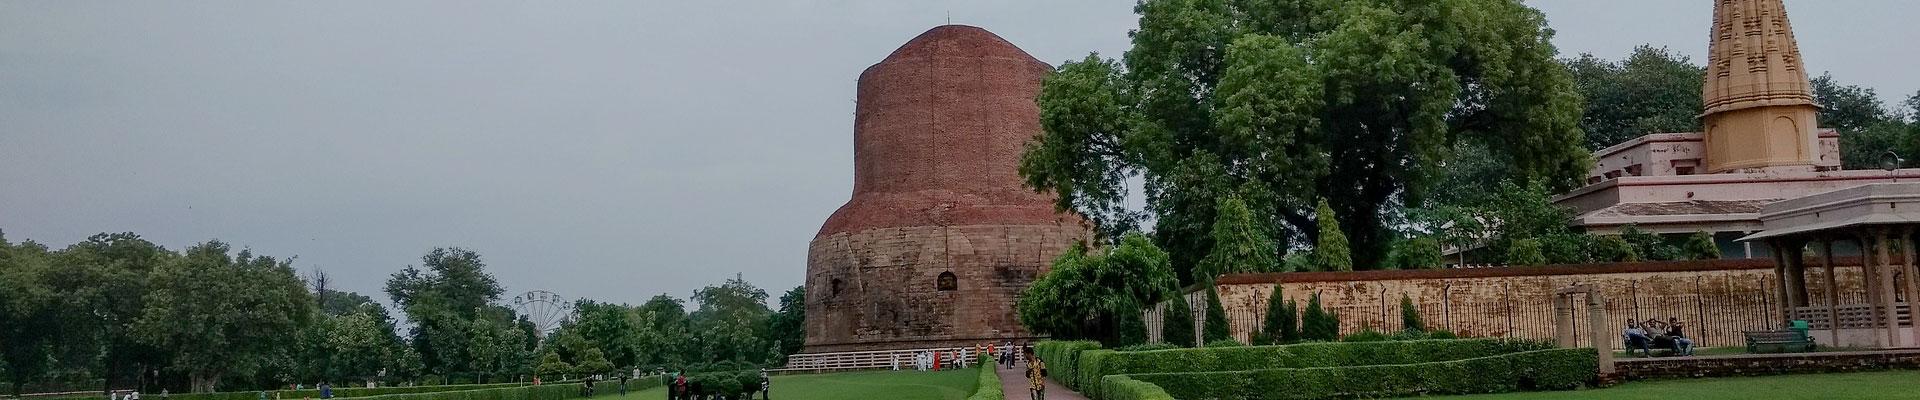 Tomb of Sarnath